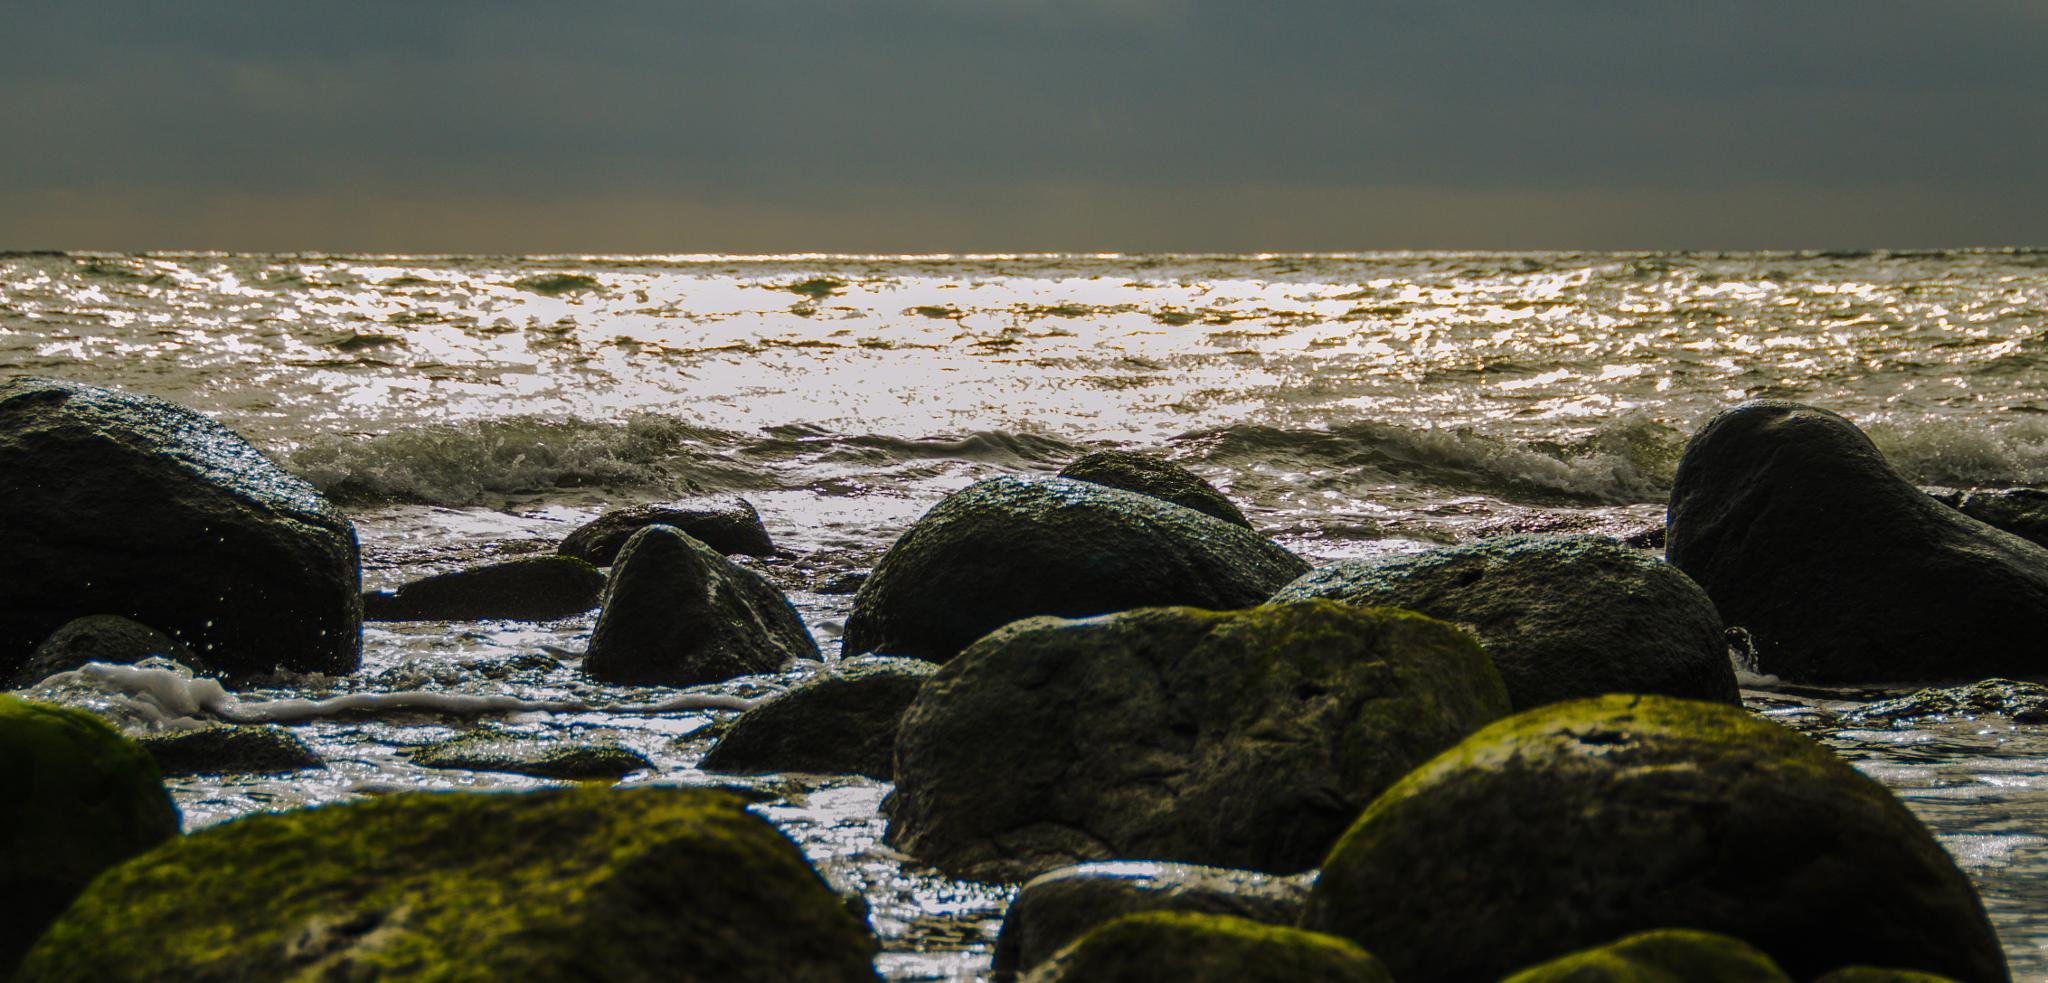 Havet  by kristina.truedsson